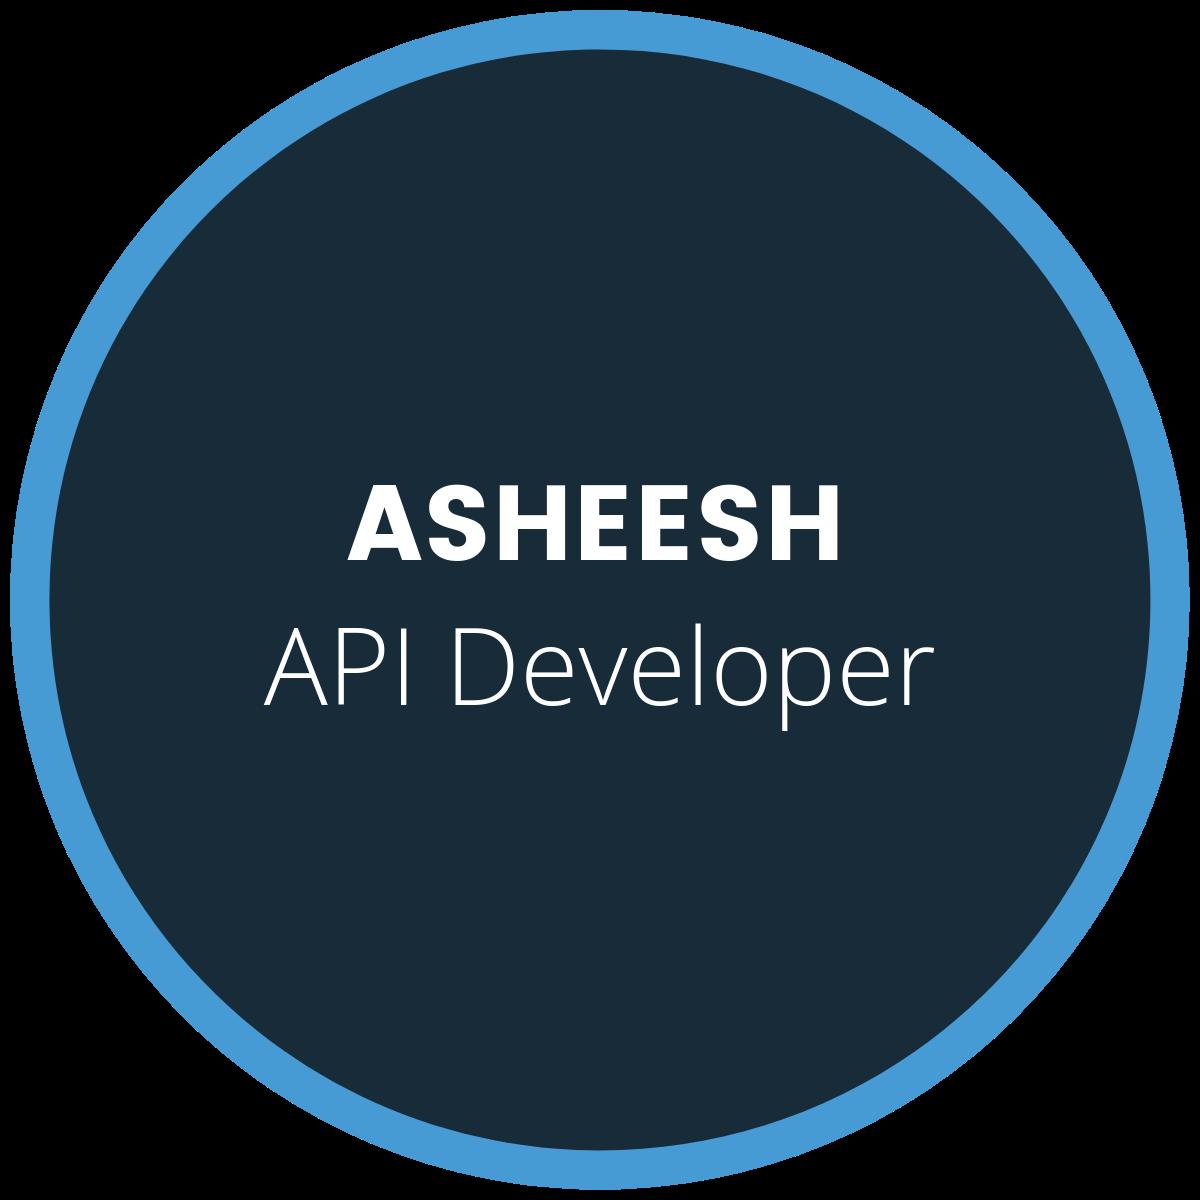 asheesh-web4realty